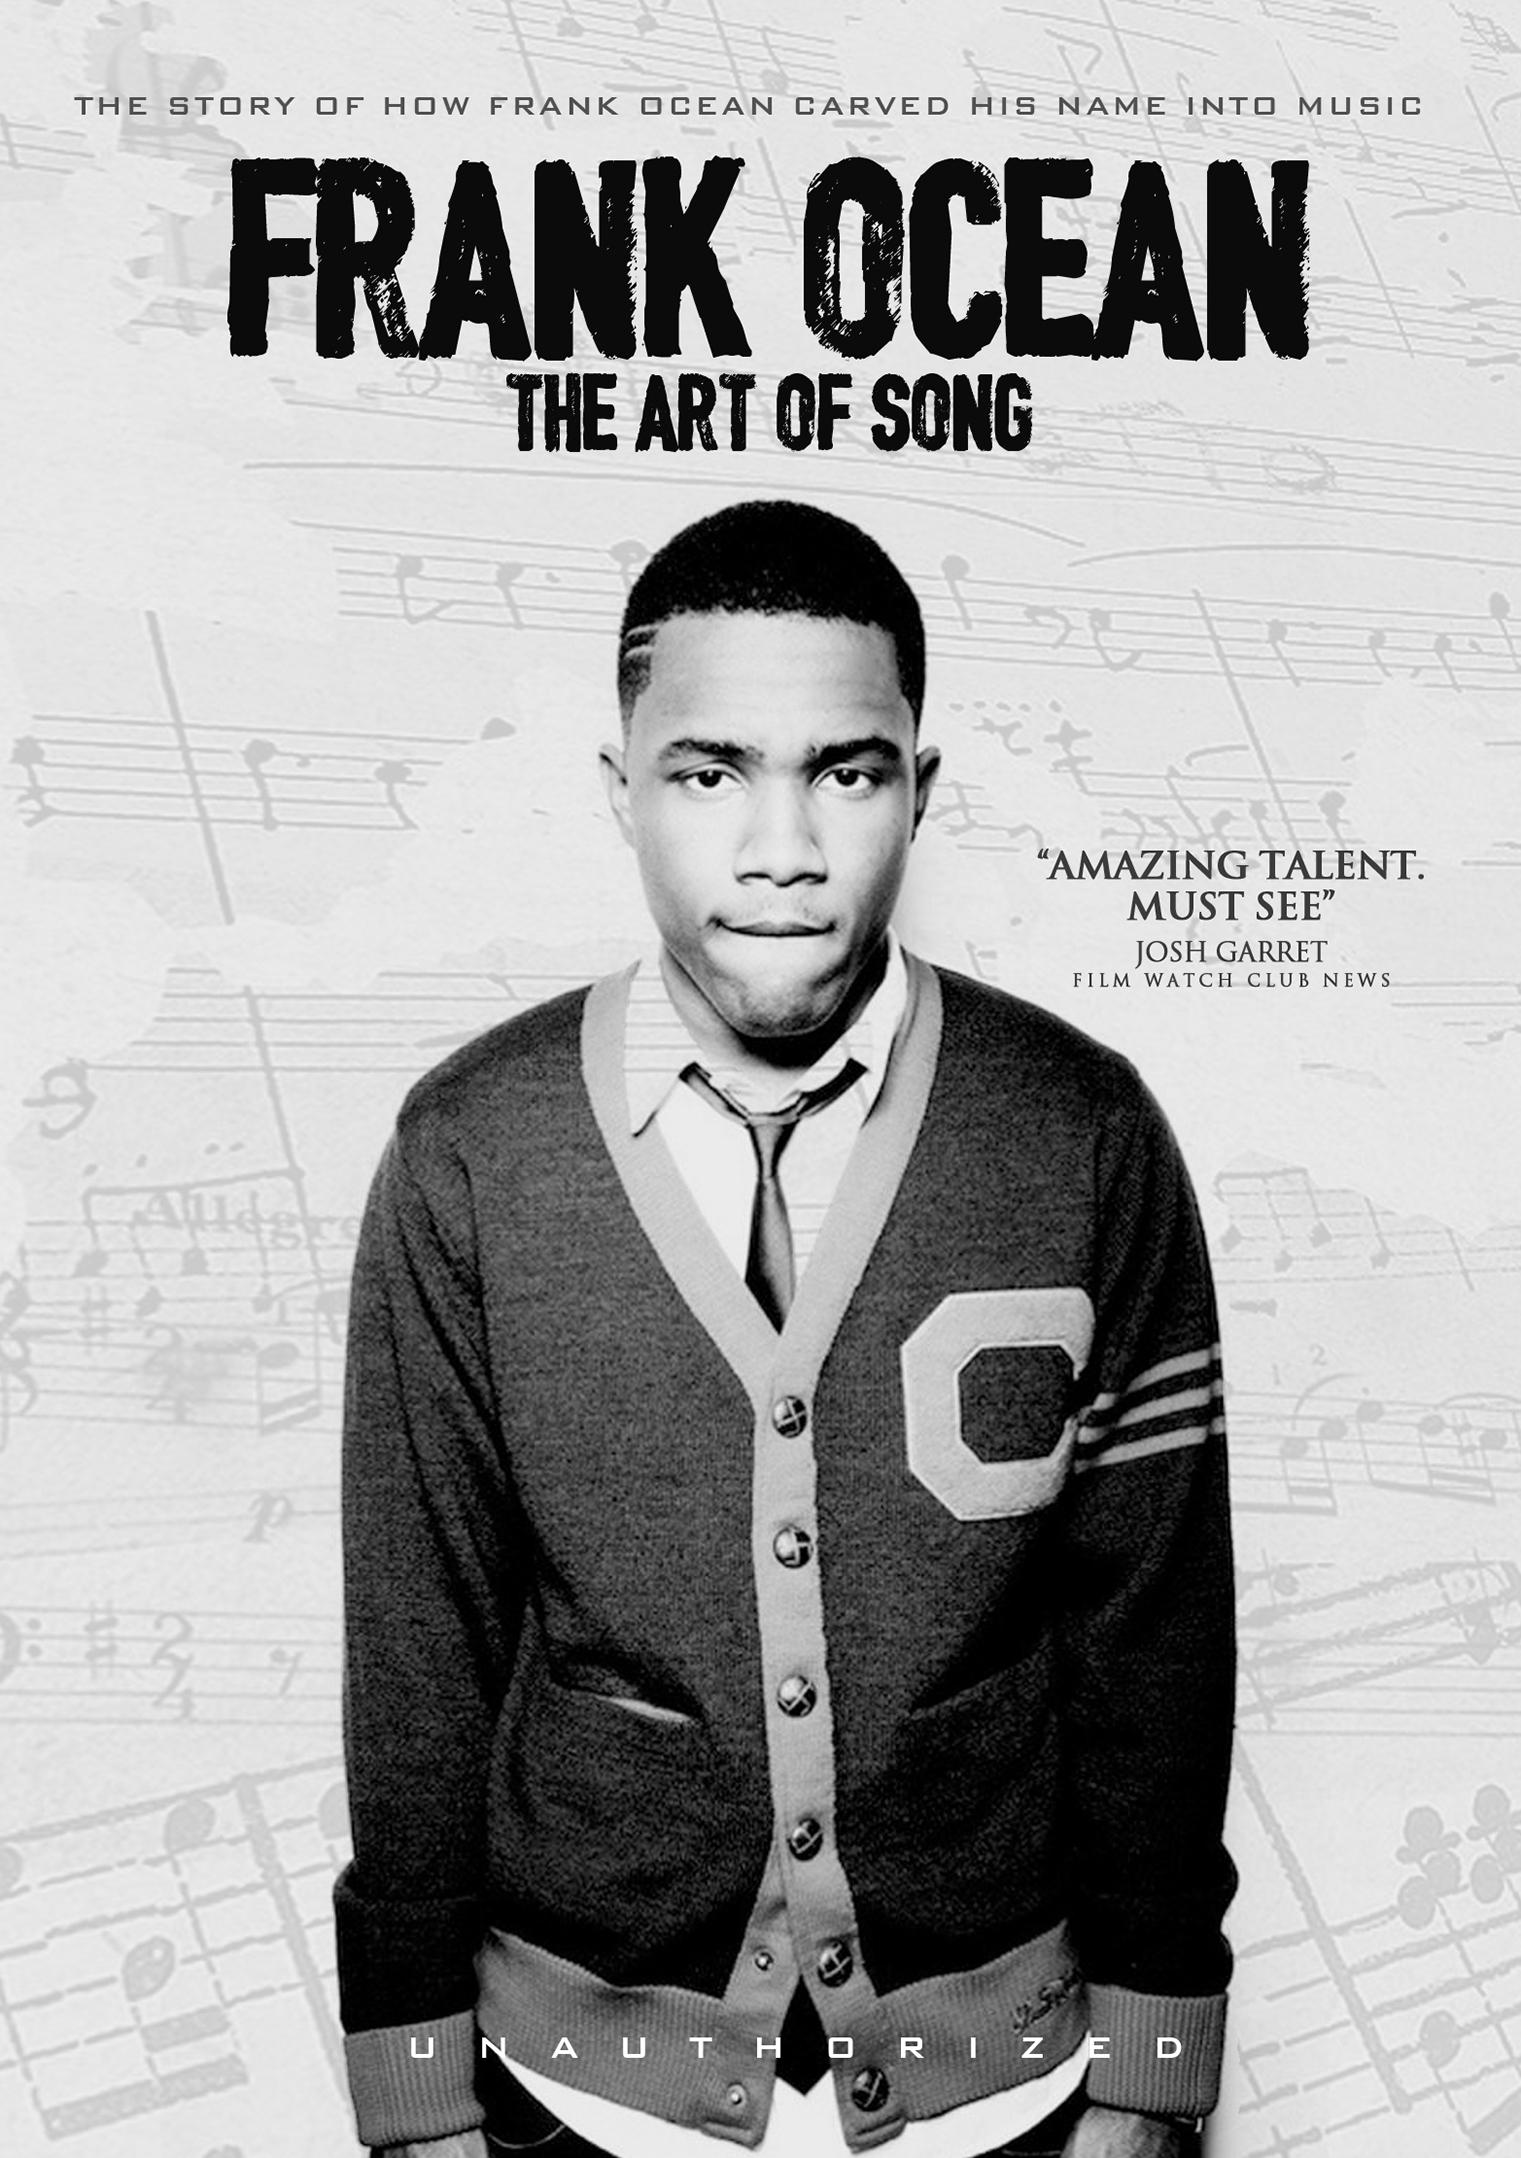 Frank Ocean: The Art of Song